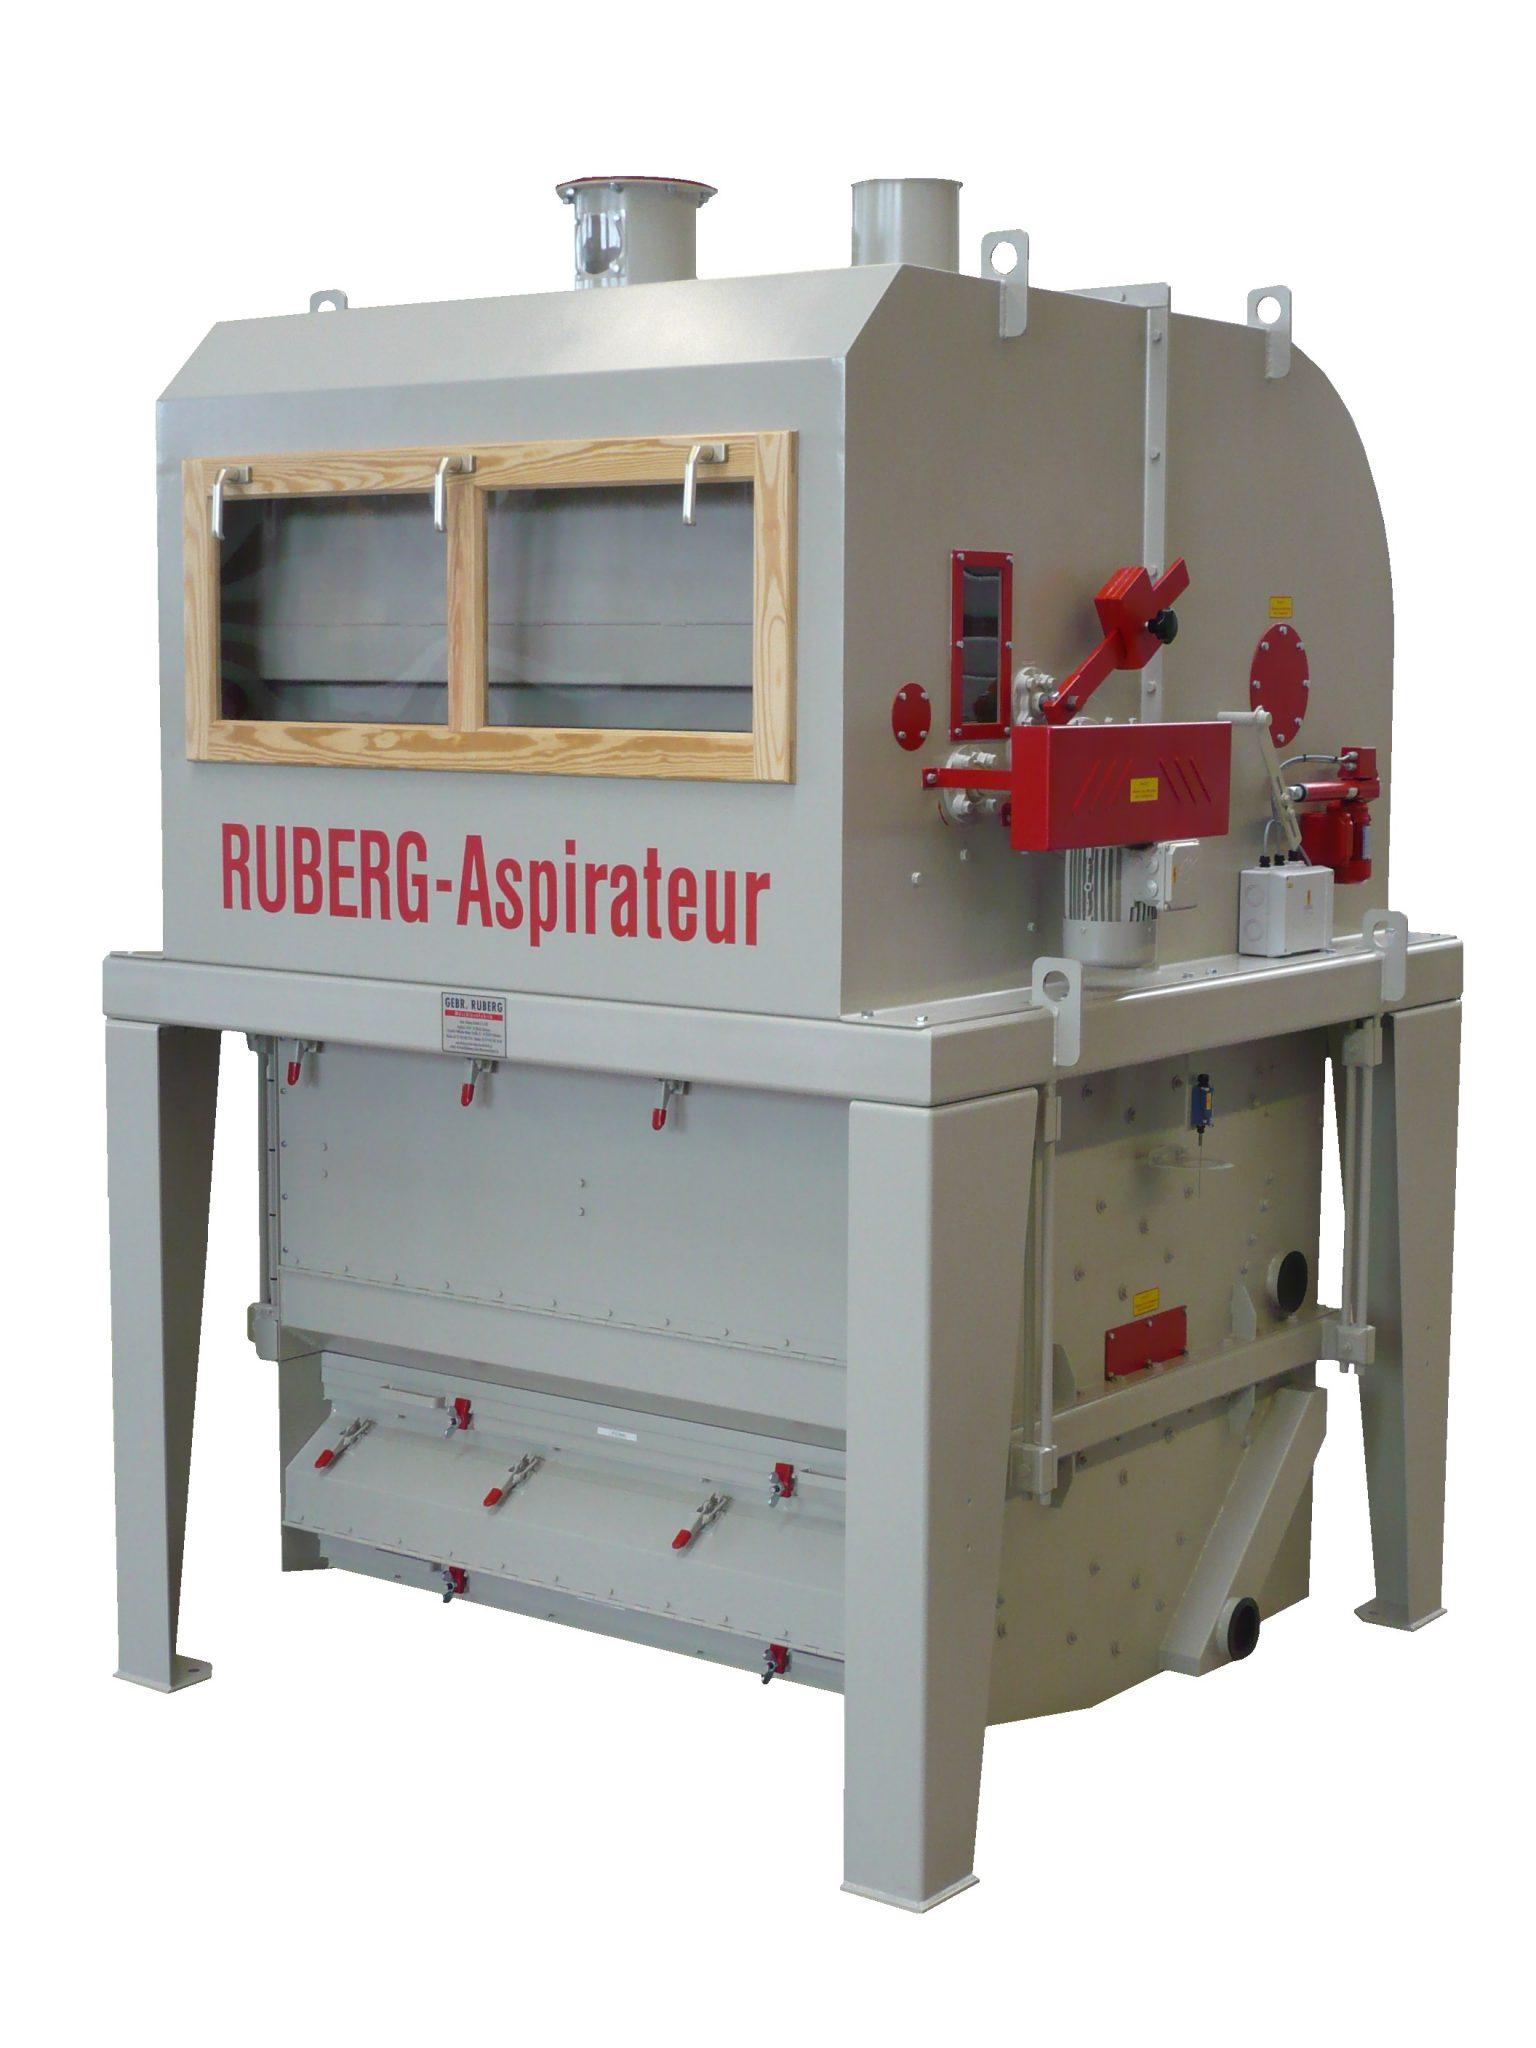 RUBERG-Aspirateur Baureihe RV 40 - RV 60